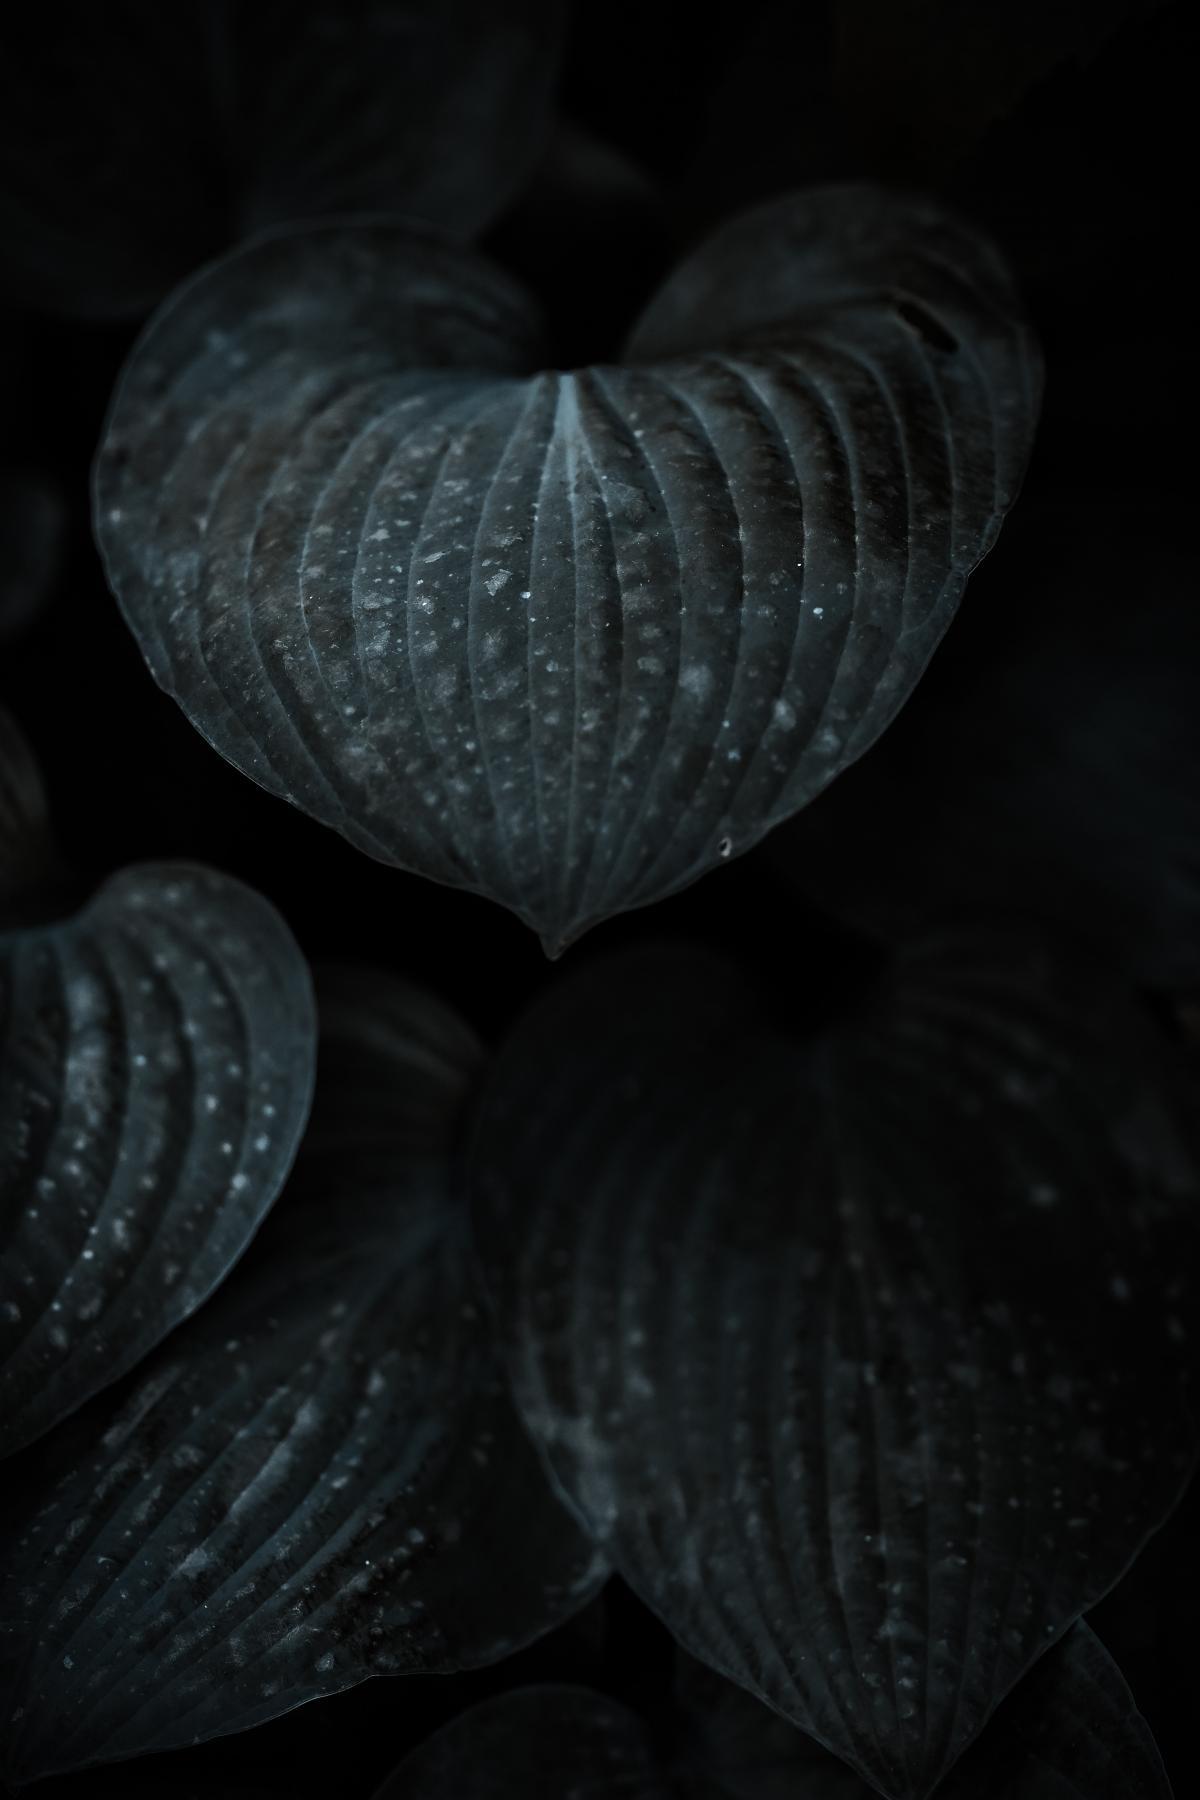 Mollusk Bivalve Invertebrate